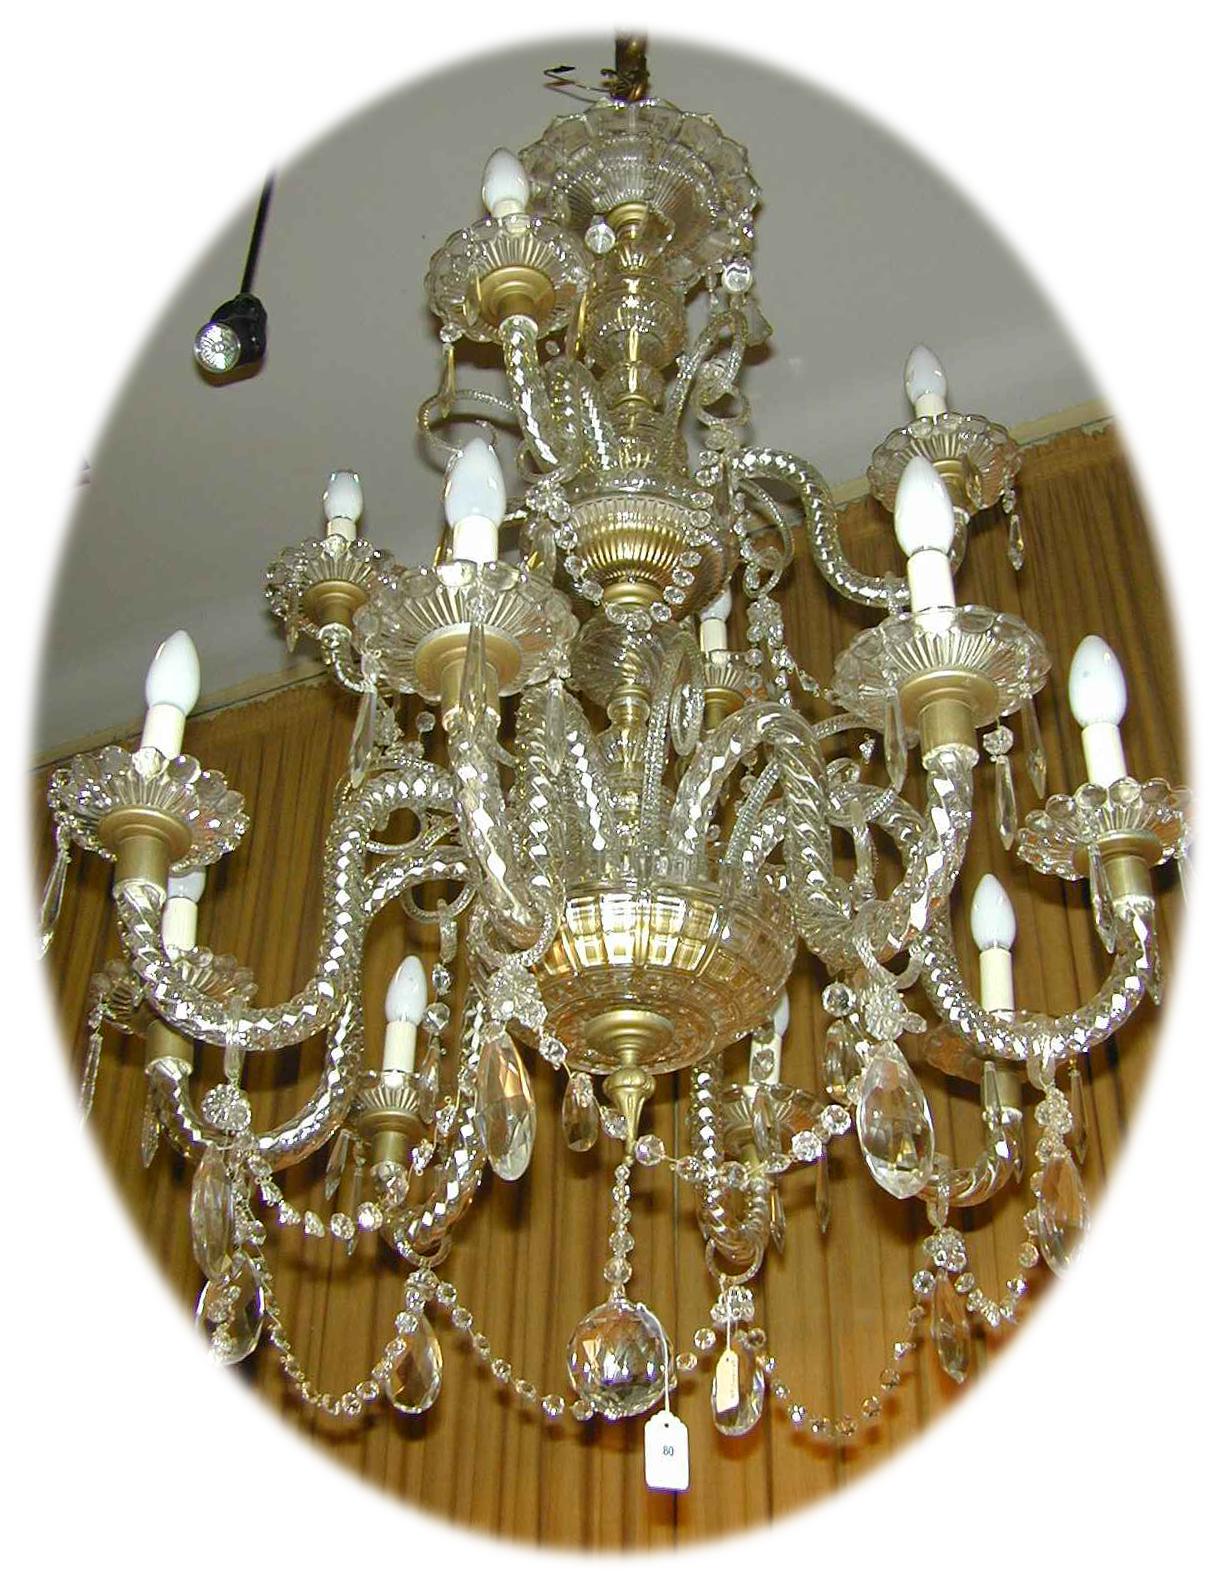 Chandelier english crystal schweitzerlinen chandelier english crystal published december 11 2014 at 1224 1595 arubaitofo Image collections